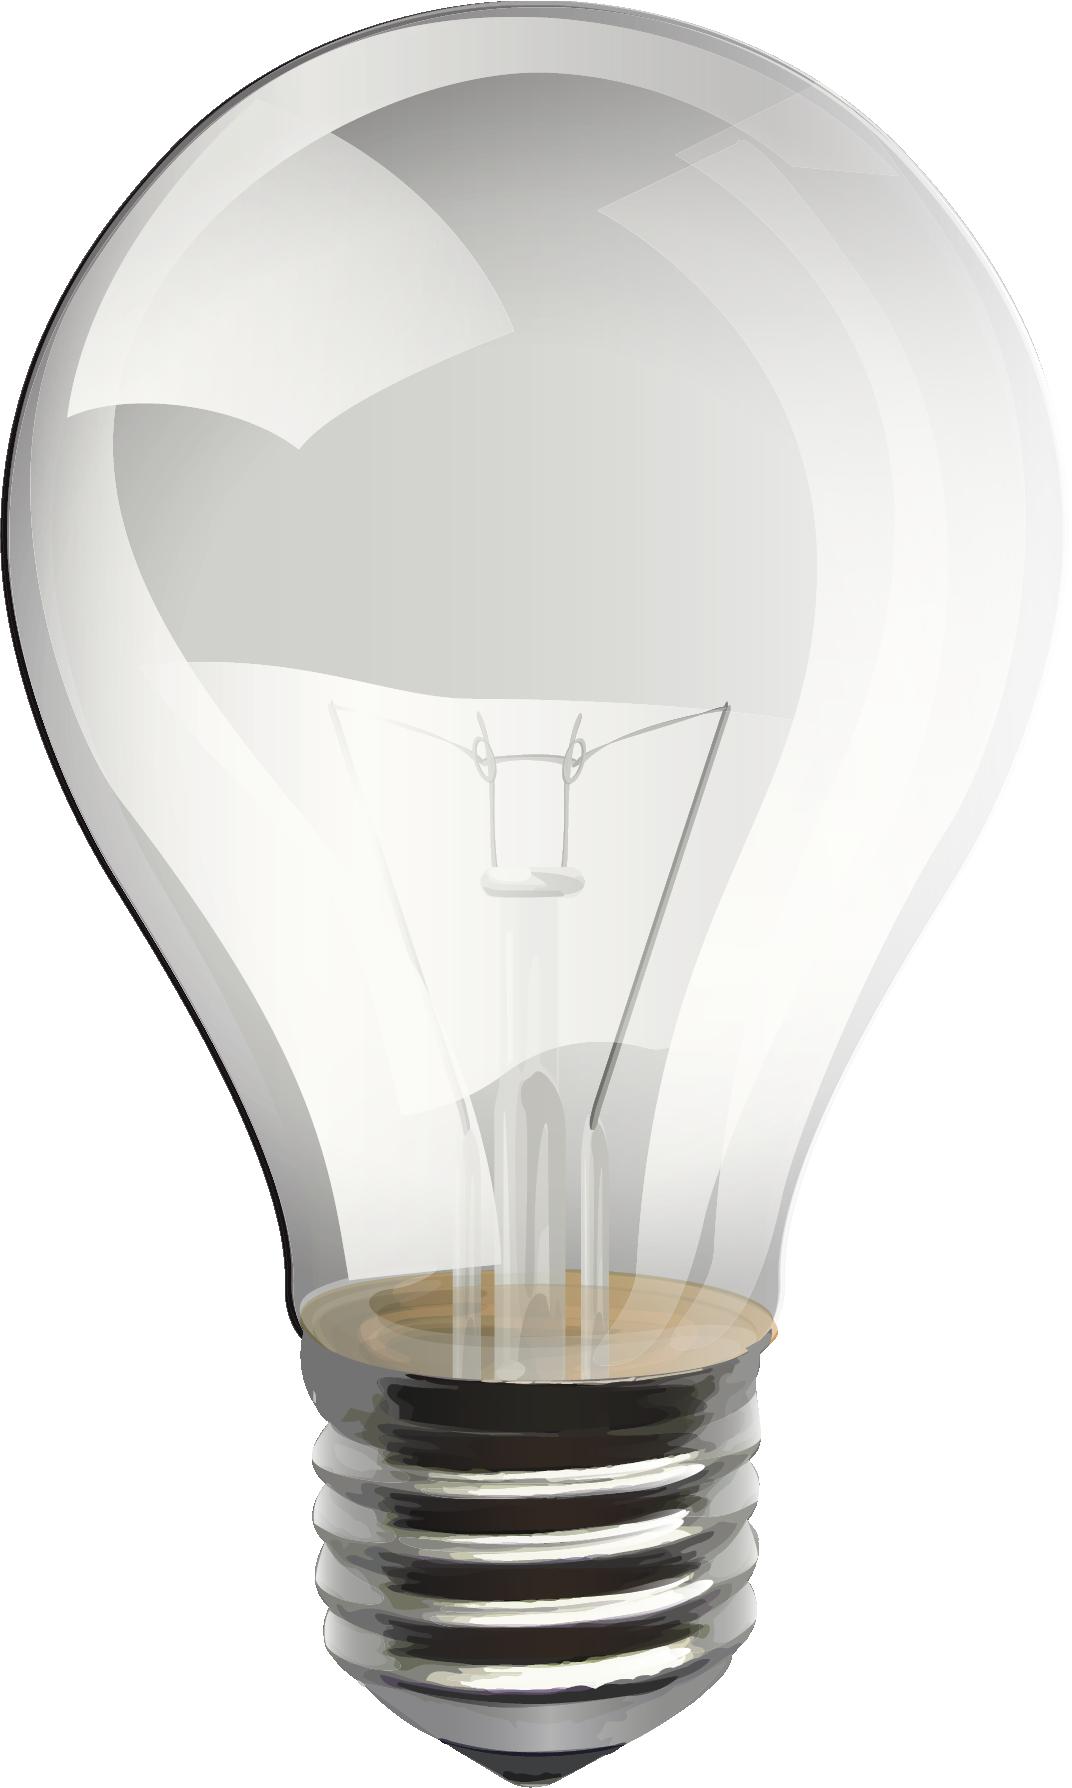 Bulb png transparent free. Lamp clipart light globe